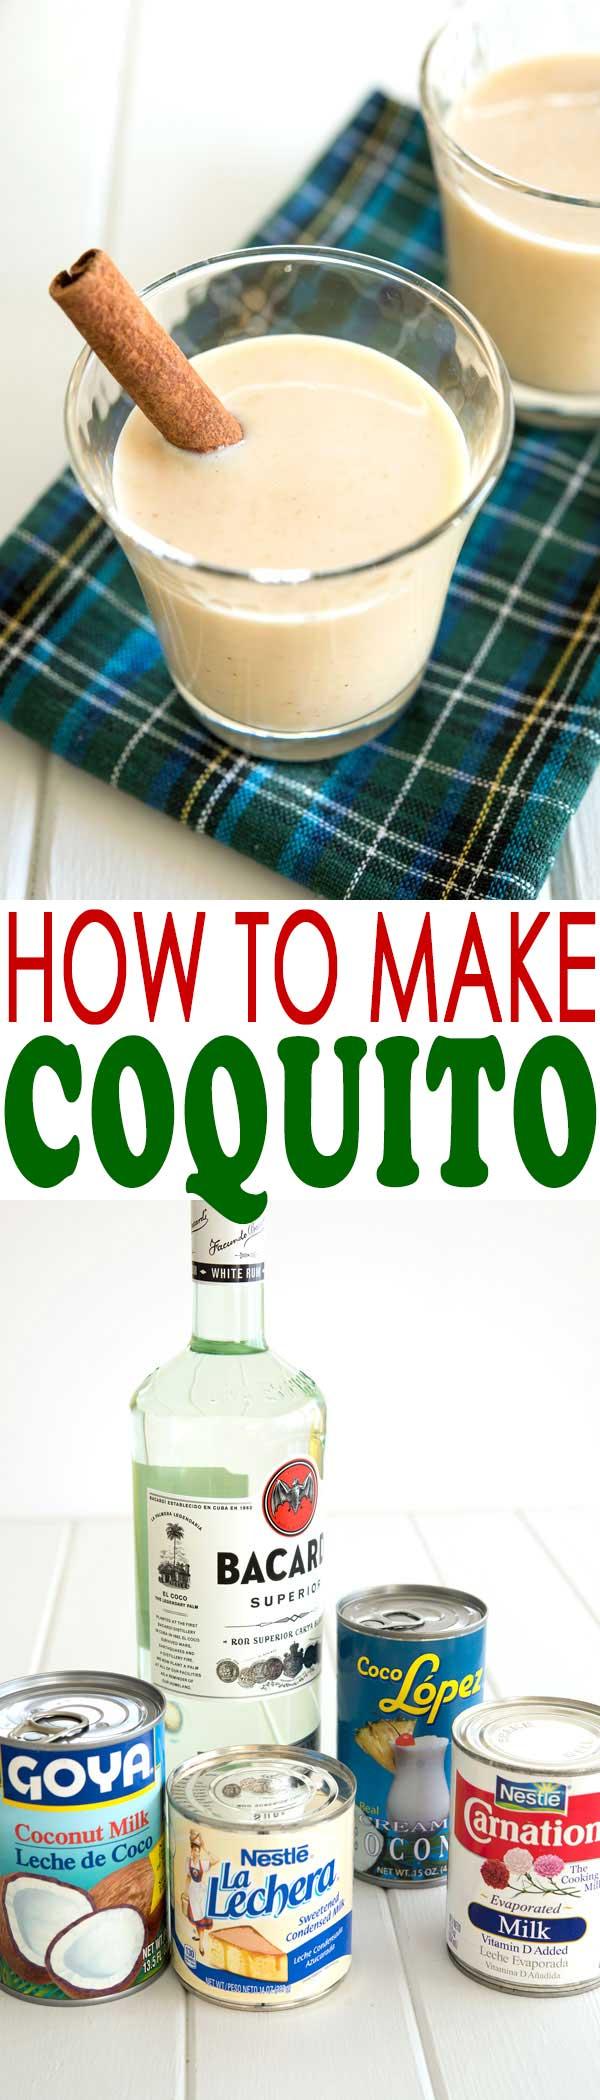 Coquito Recipe (how to make coquito)  Kitchen Gidget